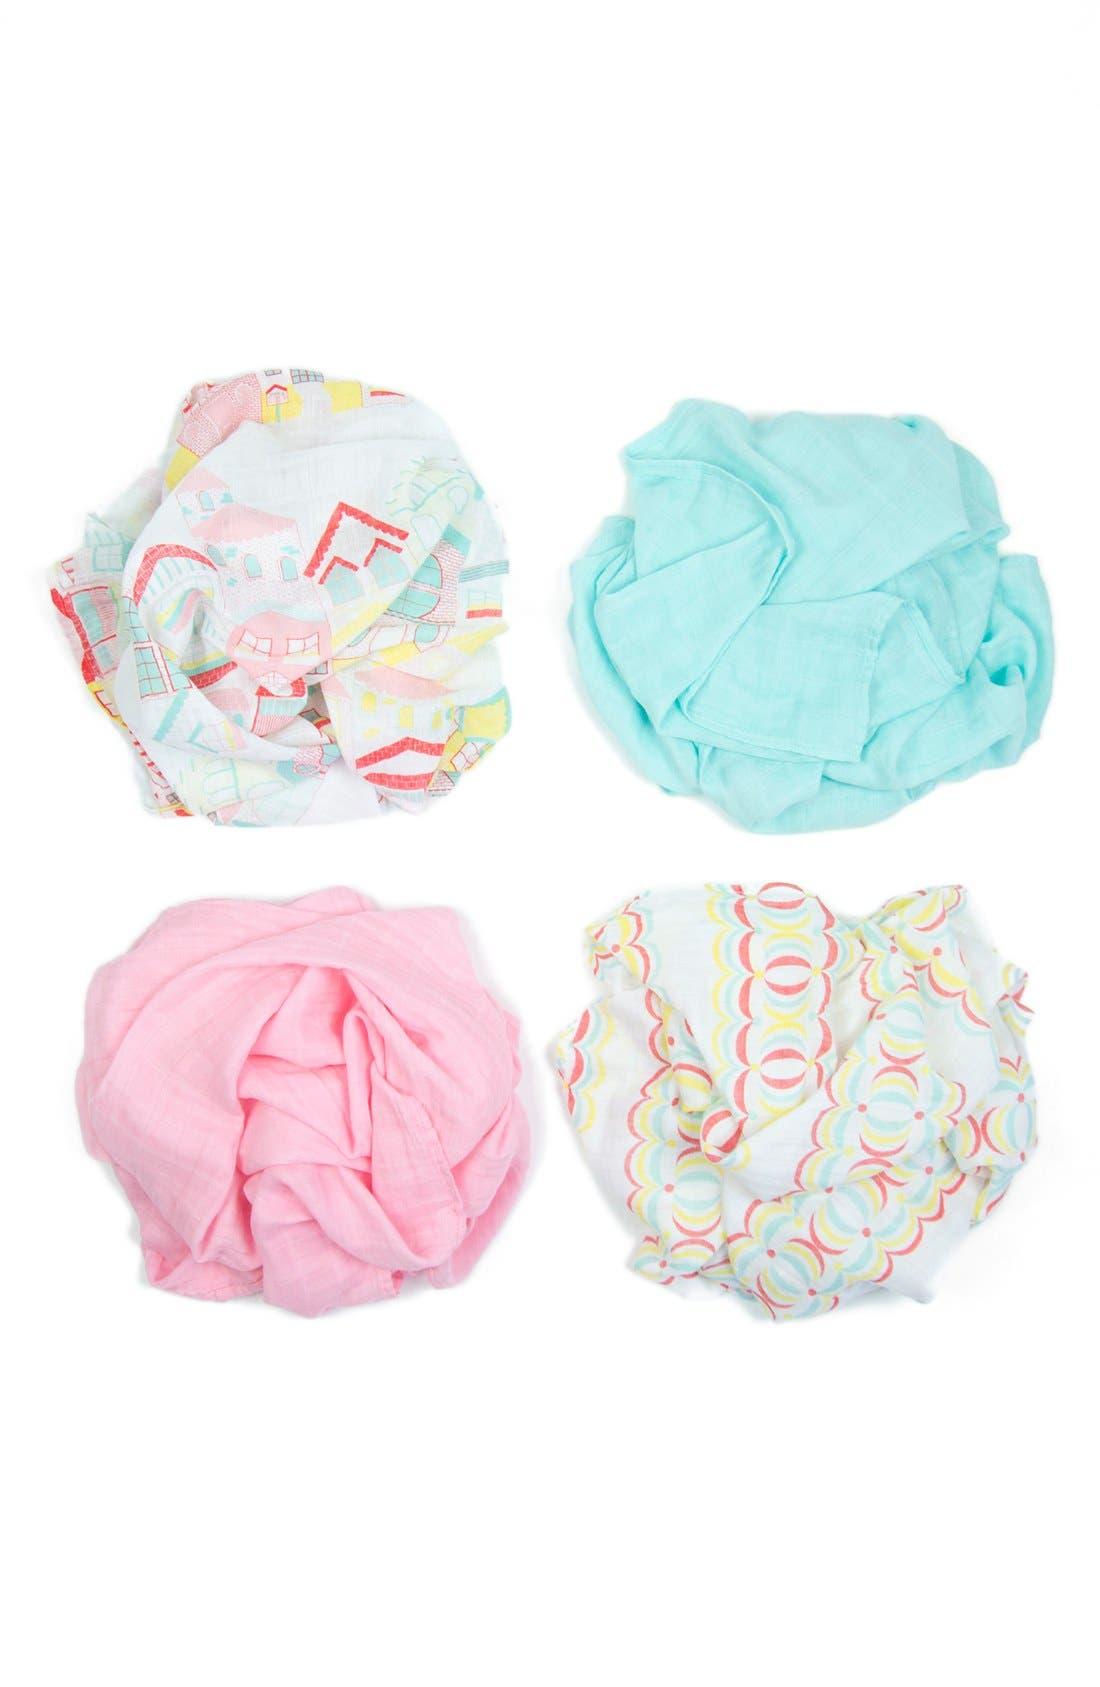 Alternate Image 1 Selected - The Little Linen Company 'Weegoamigo' Muslin Swaddle Blanket (4-Pack)